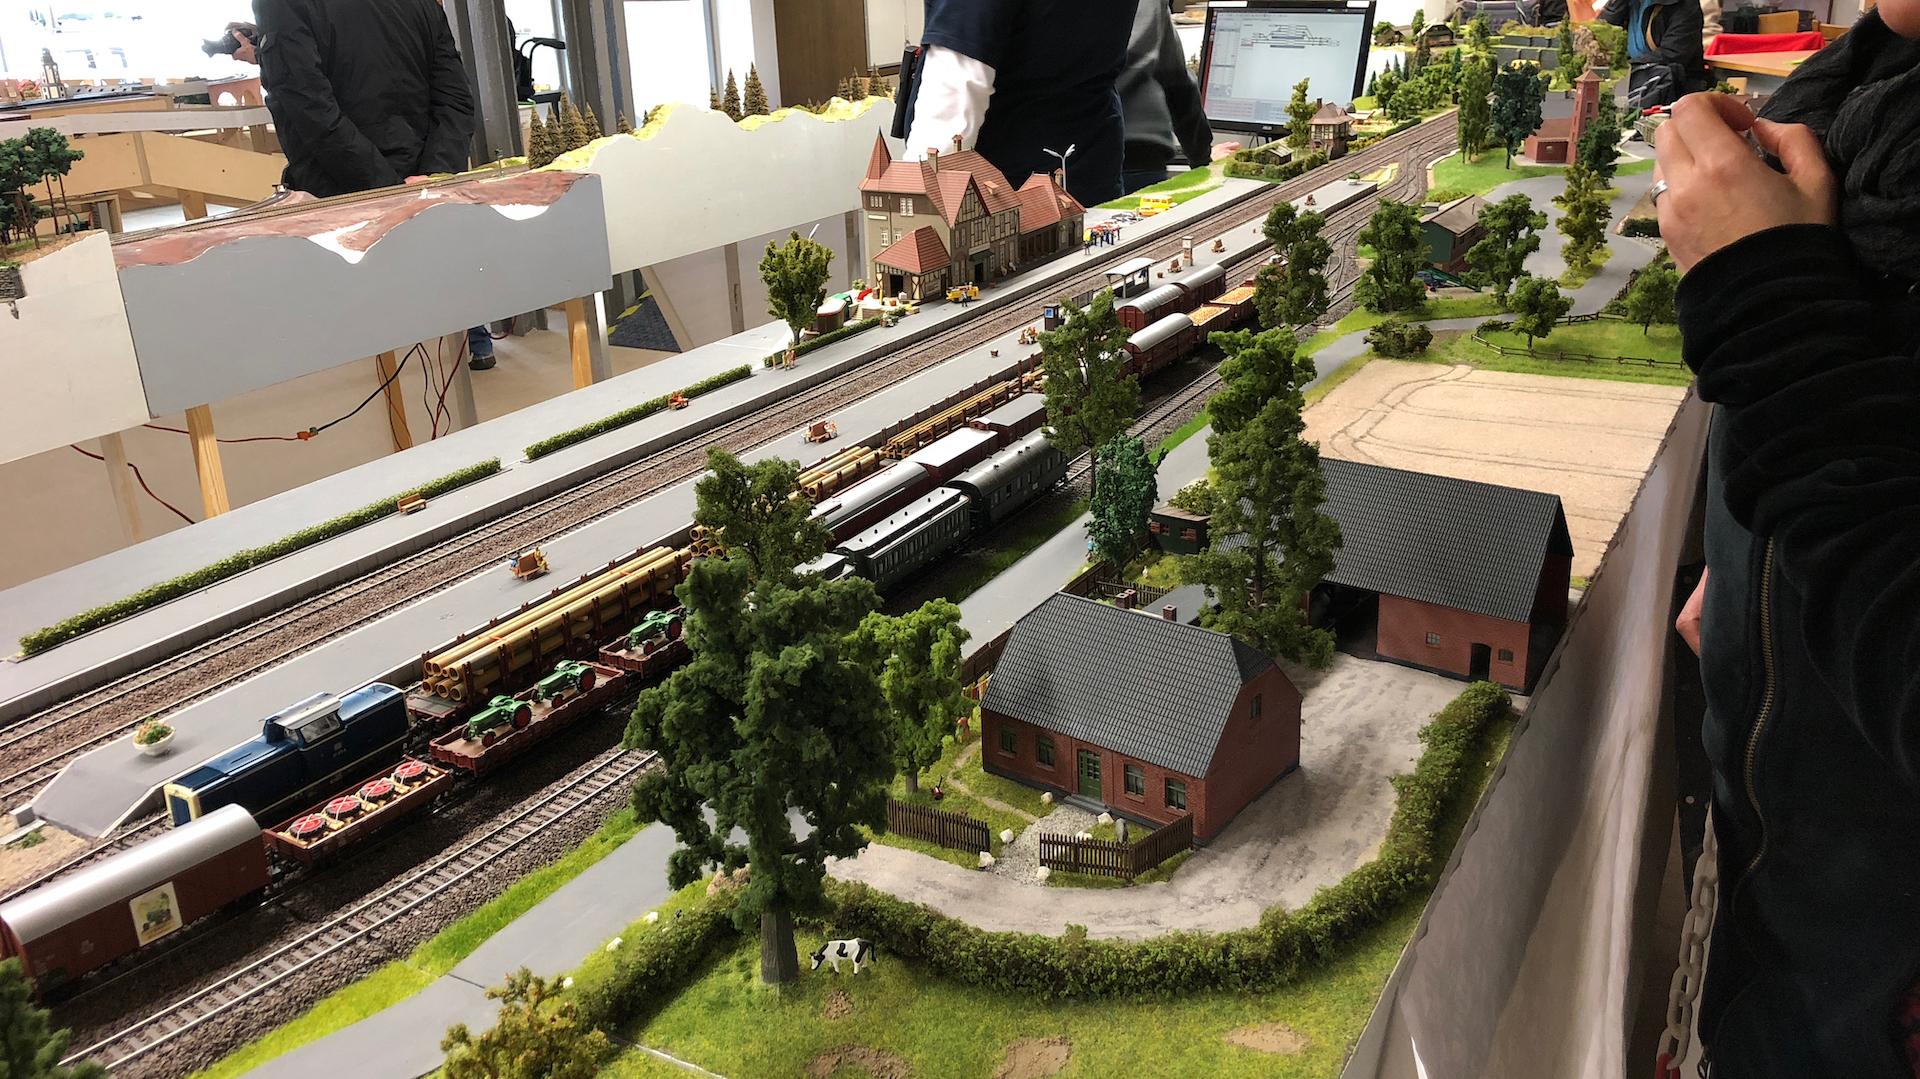 18_02_24_Schautag-Eisenbahnfreunde-Hameln_023